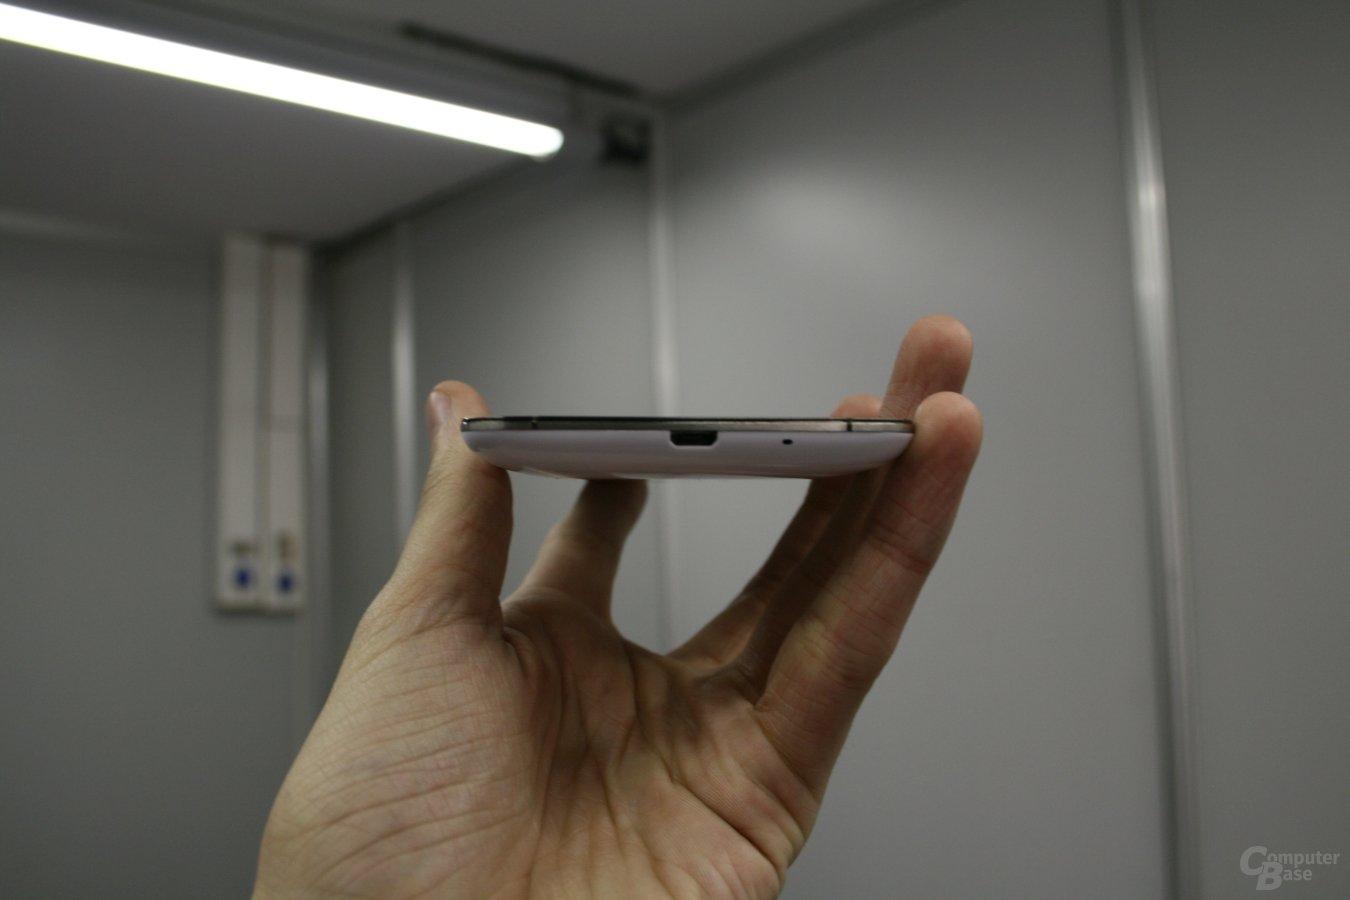 Meizus Ubuntu-Smartphone ausprobiert